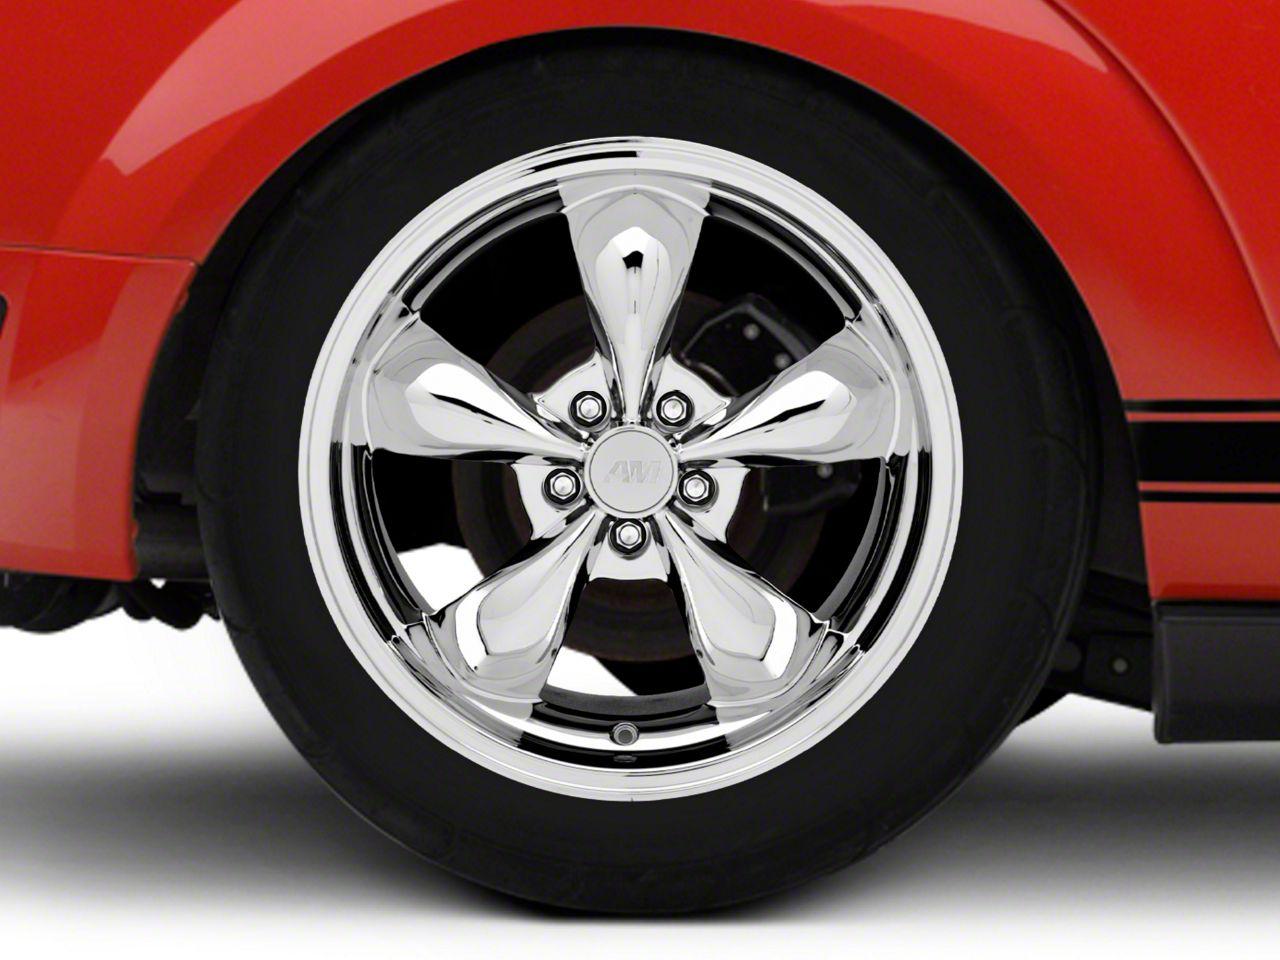 mustang deep dish bullitt chrome wheel 19x10 05 14 standard gt v6 Mustang Mach 2 Concept deep dish bullitt chrome wheel 19x10 rear only 05 14 standard gt